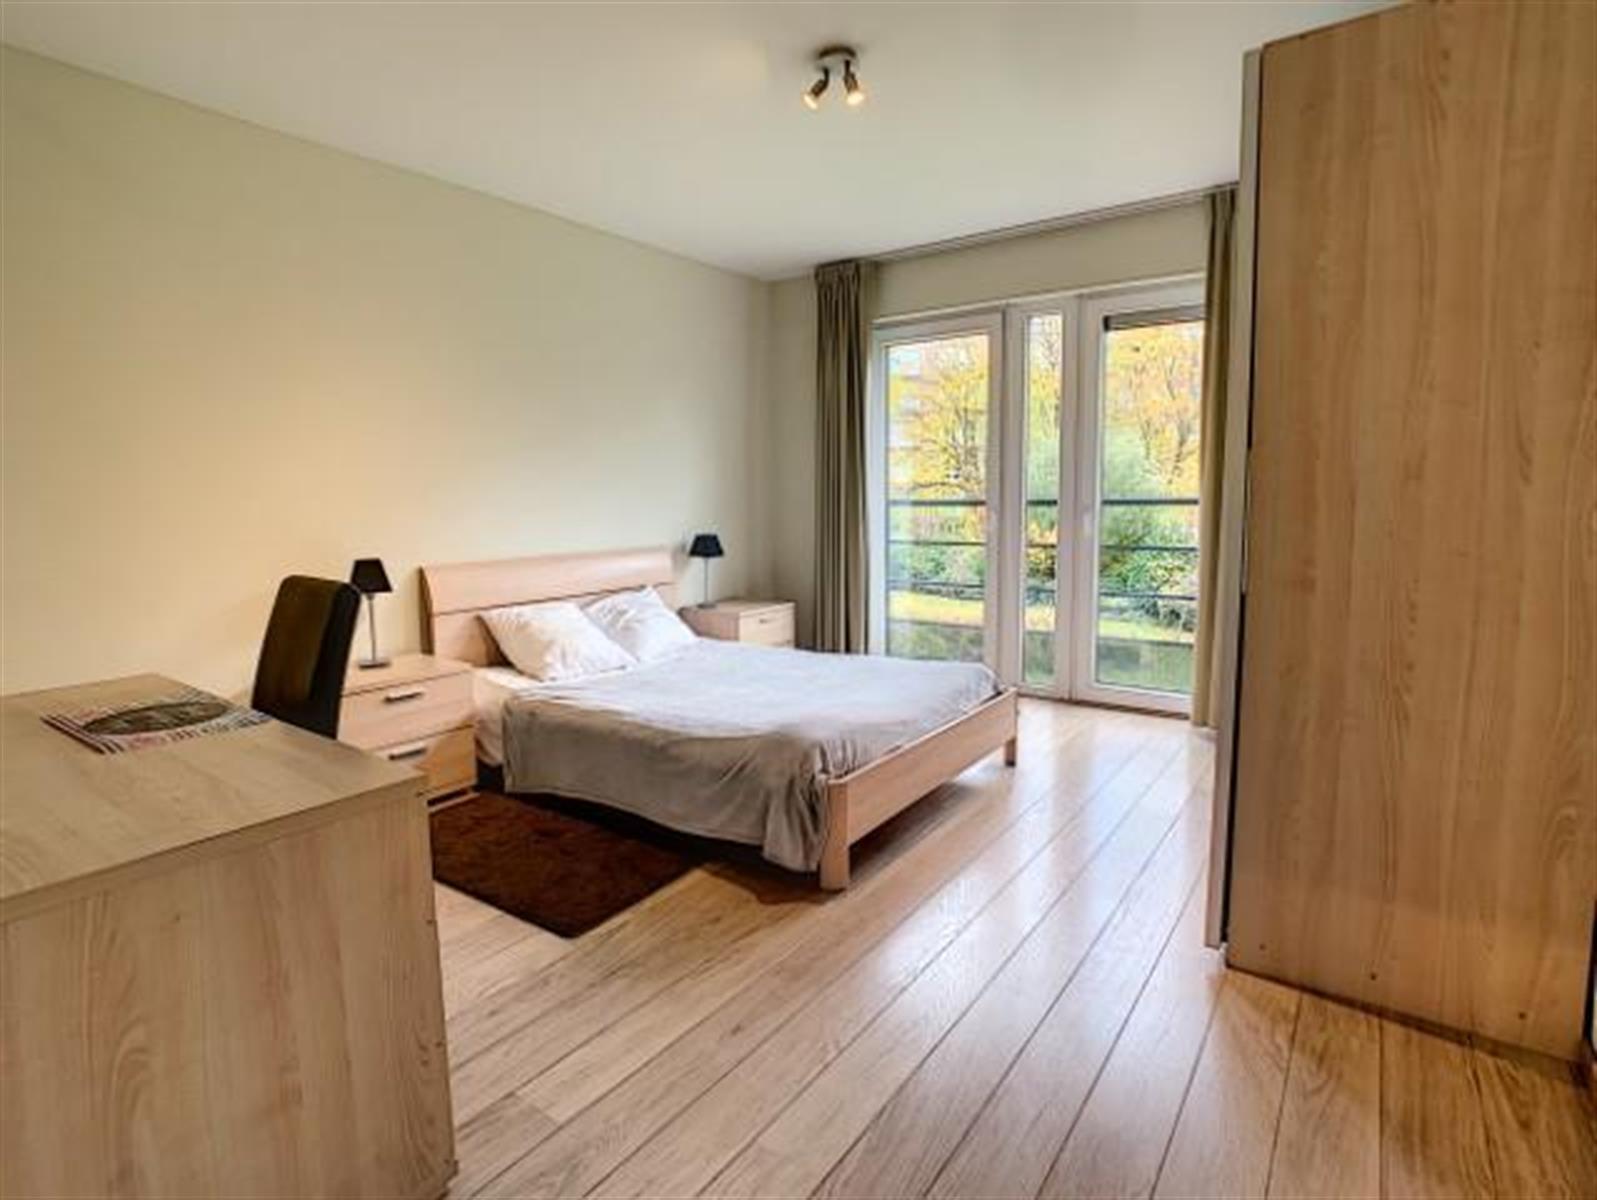 Appartement - Woluwe-Saint-Lambert - #4147227-8